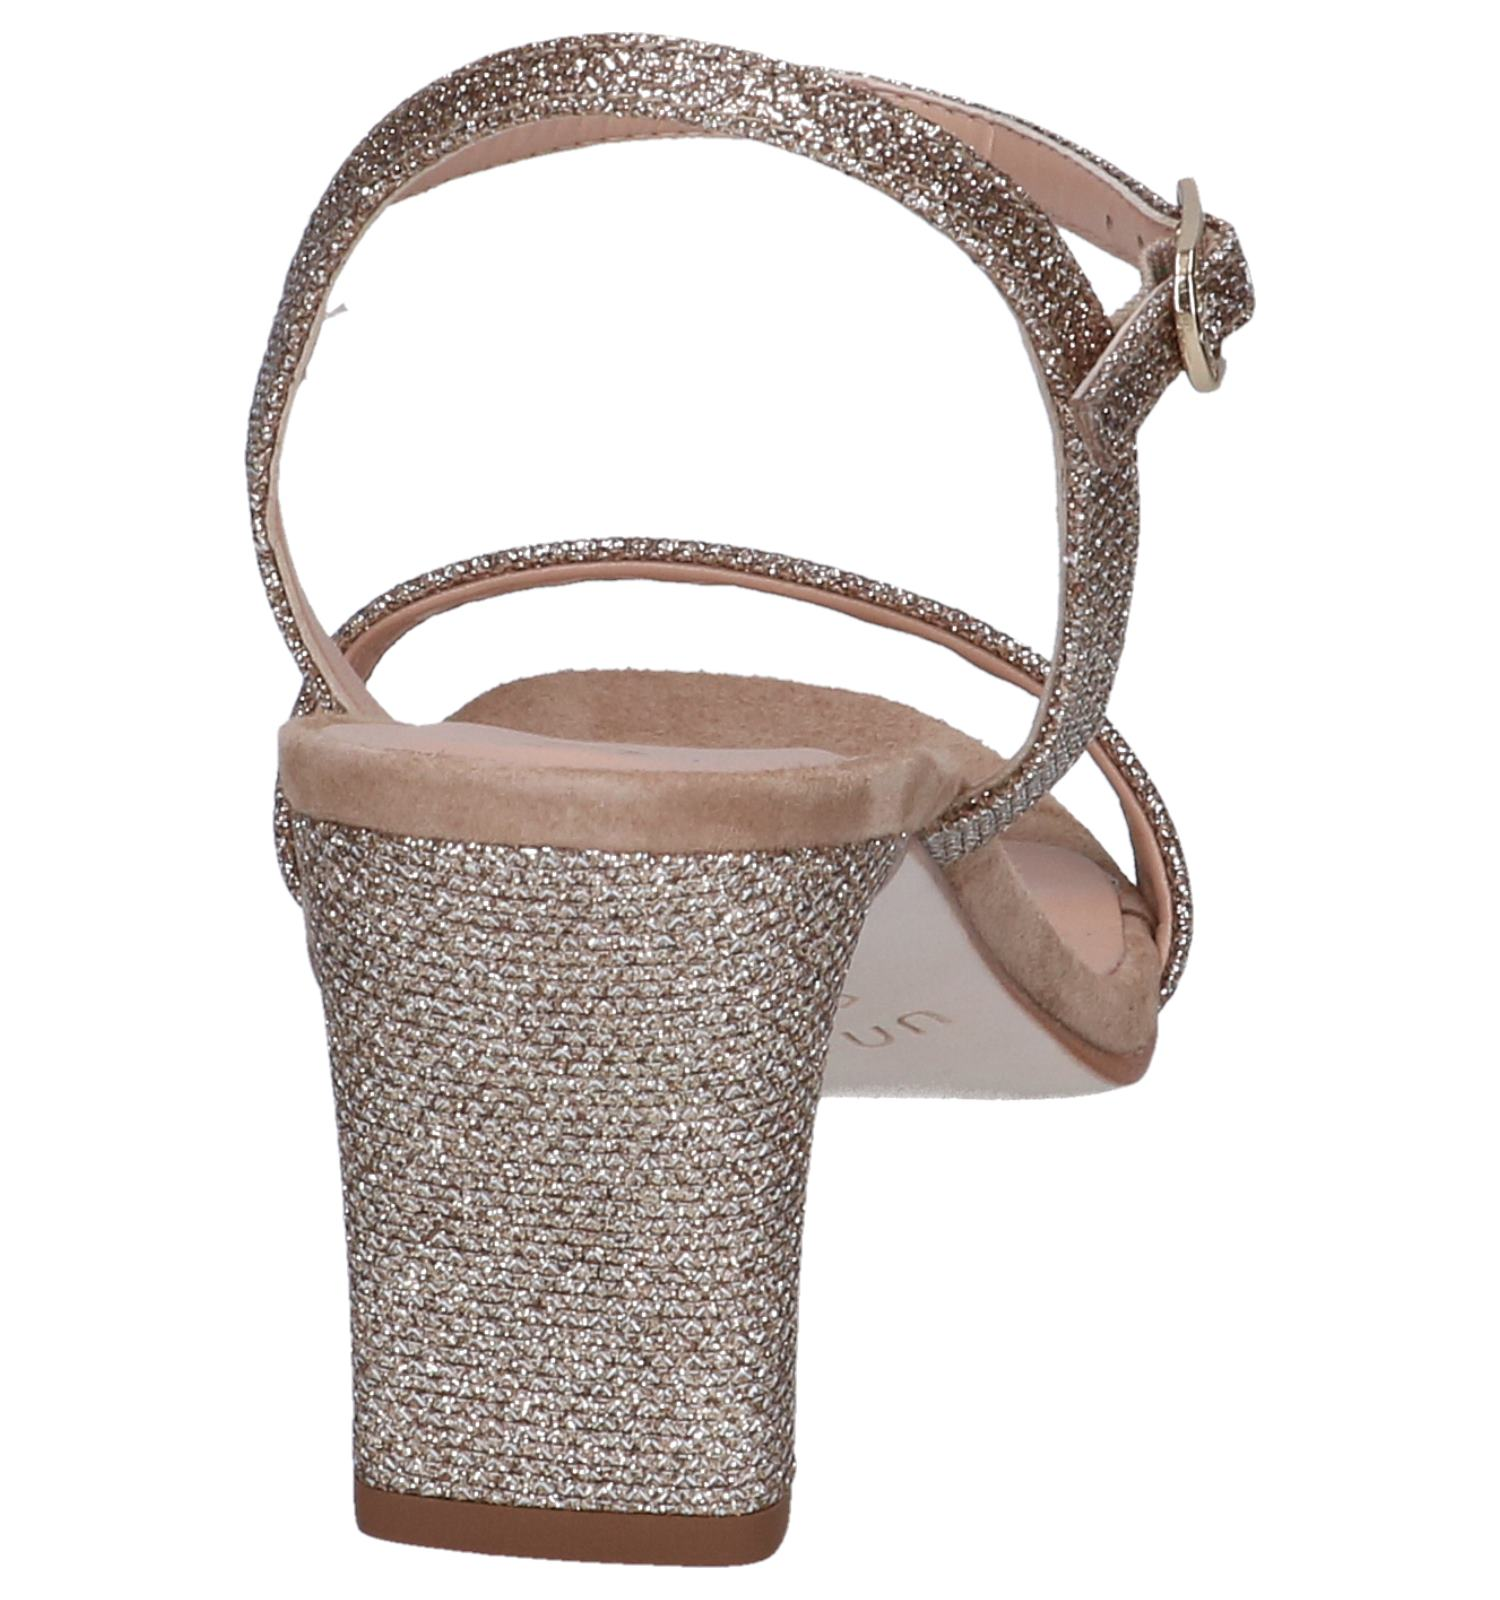 Unisa Sandalen Unisa Unisa Gouden Sandalen Sandalen Mabre Gouden Mabre Gouden 0vwONm8n